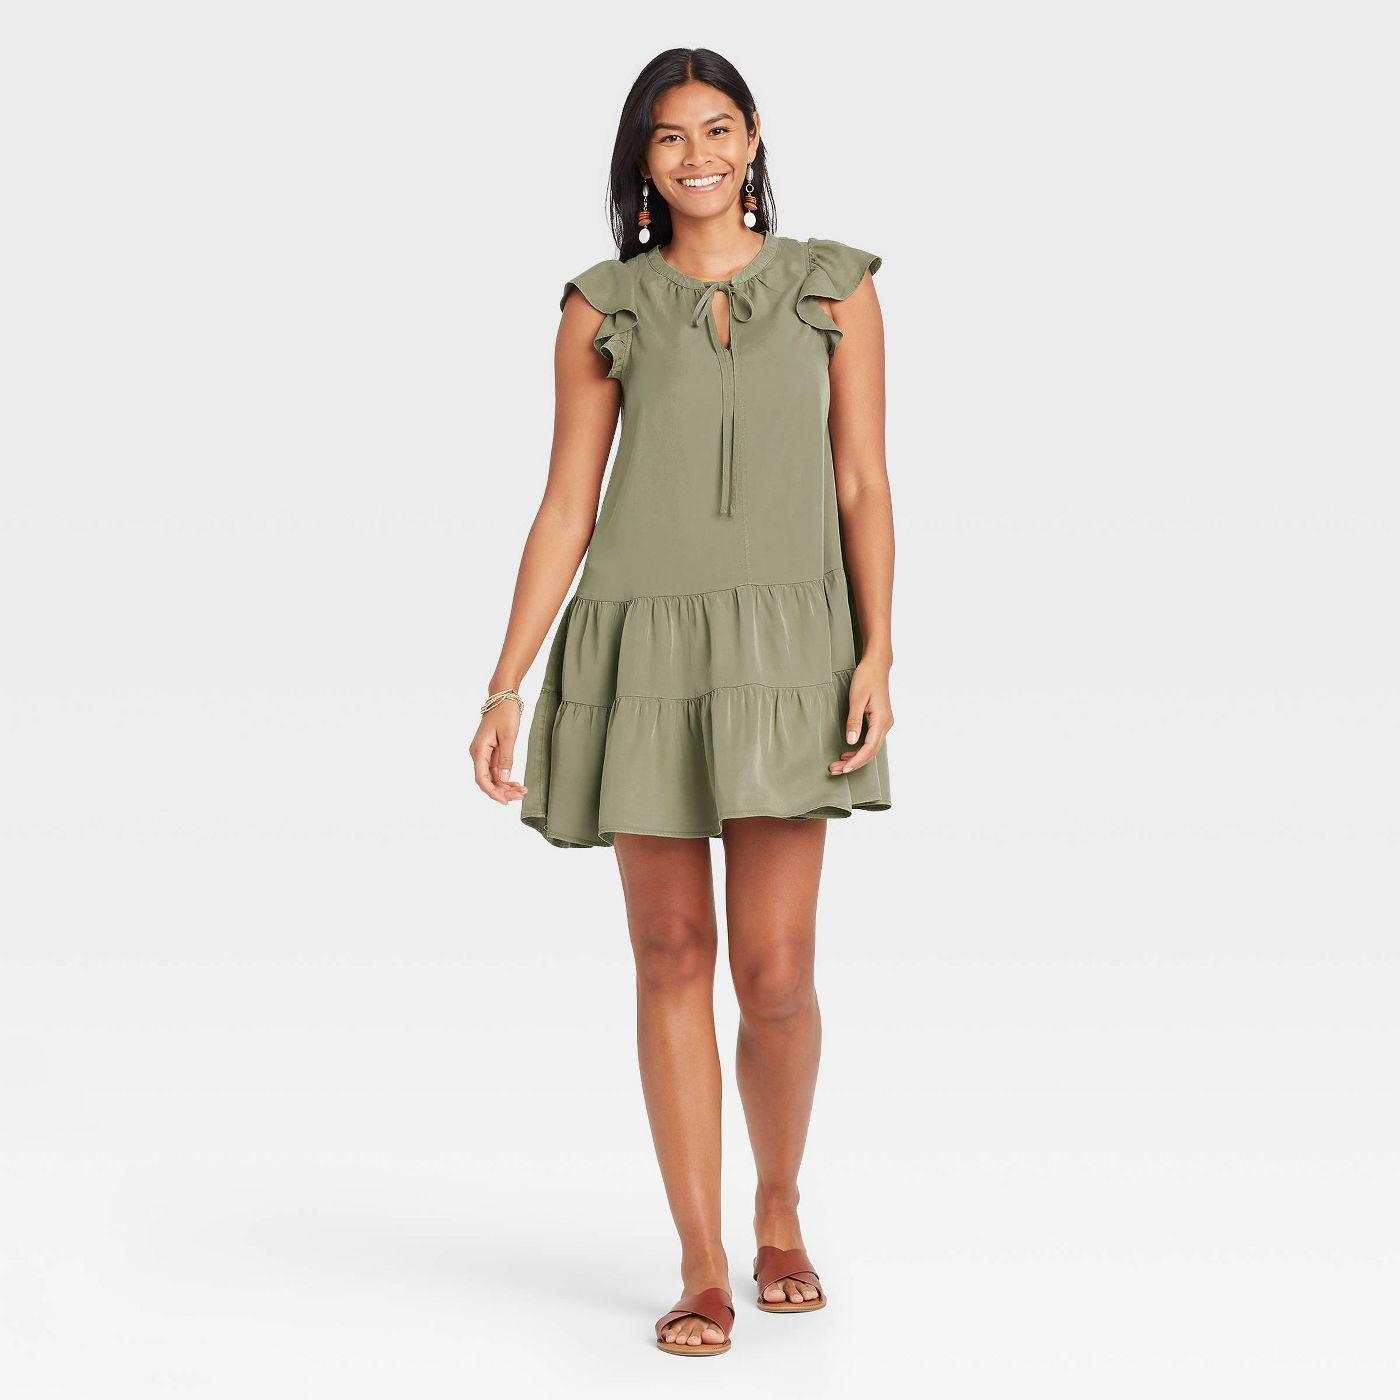 Women's Flutter Short Sleeve Ruffle Dress - Knox Rose™ - image 1 of 8